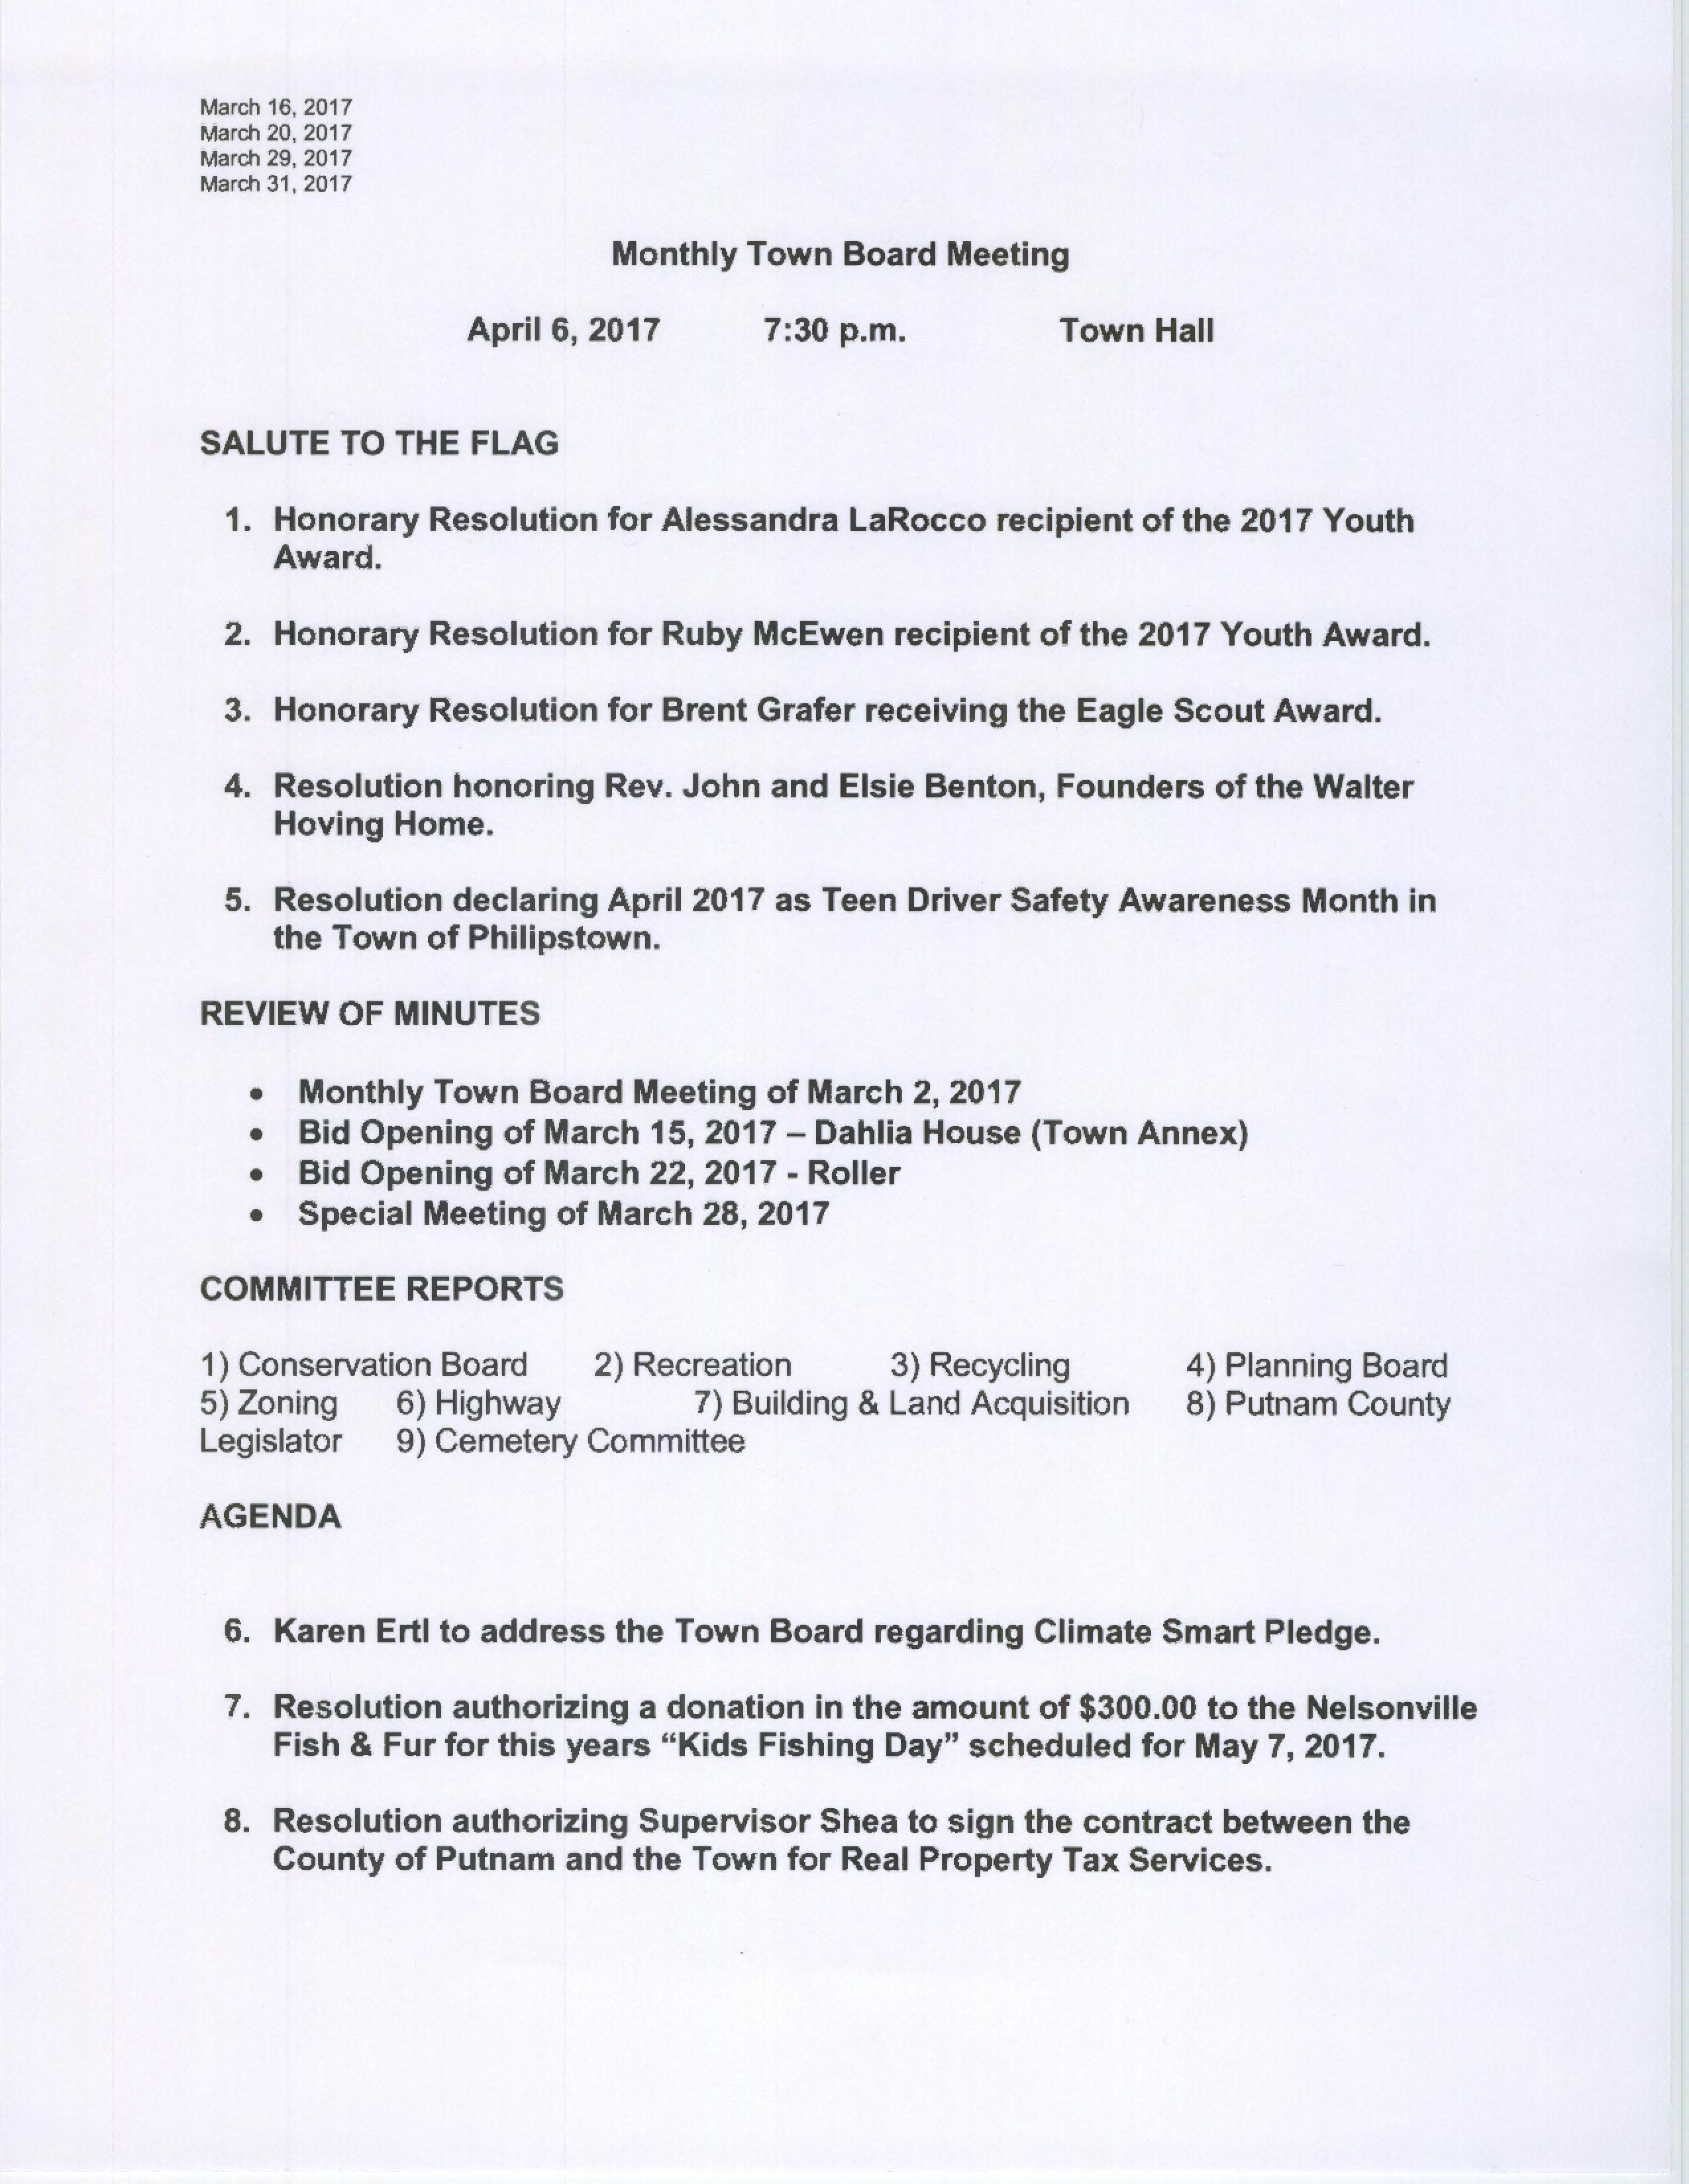 2017_04-06_Town_Board_Agenda_1.jpg